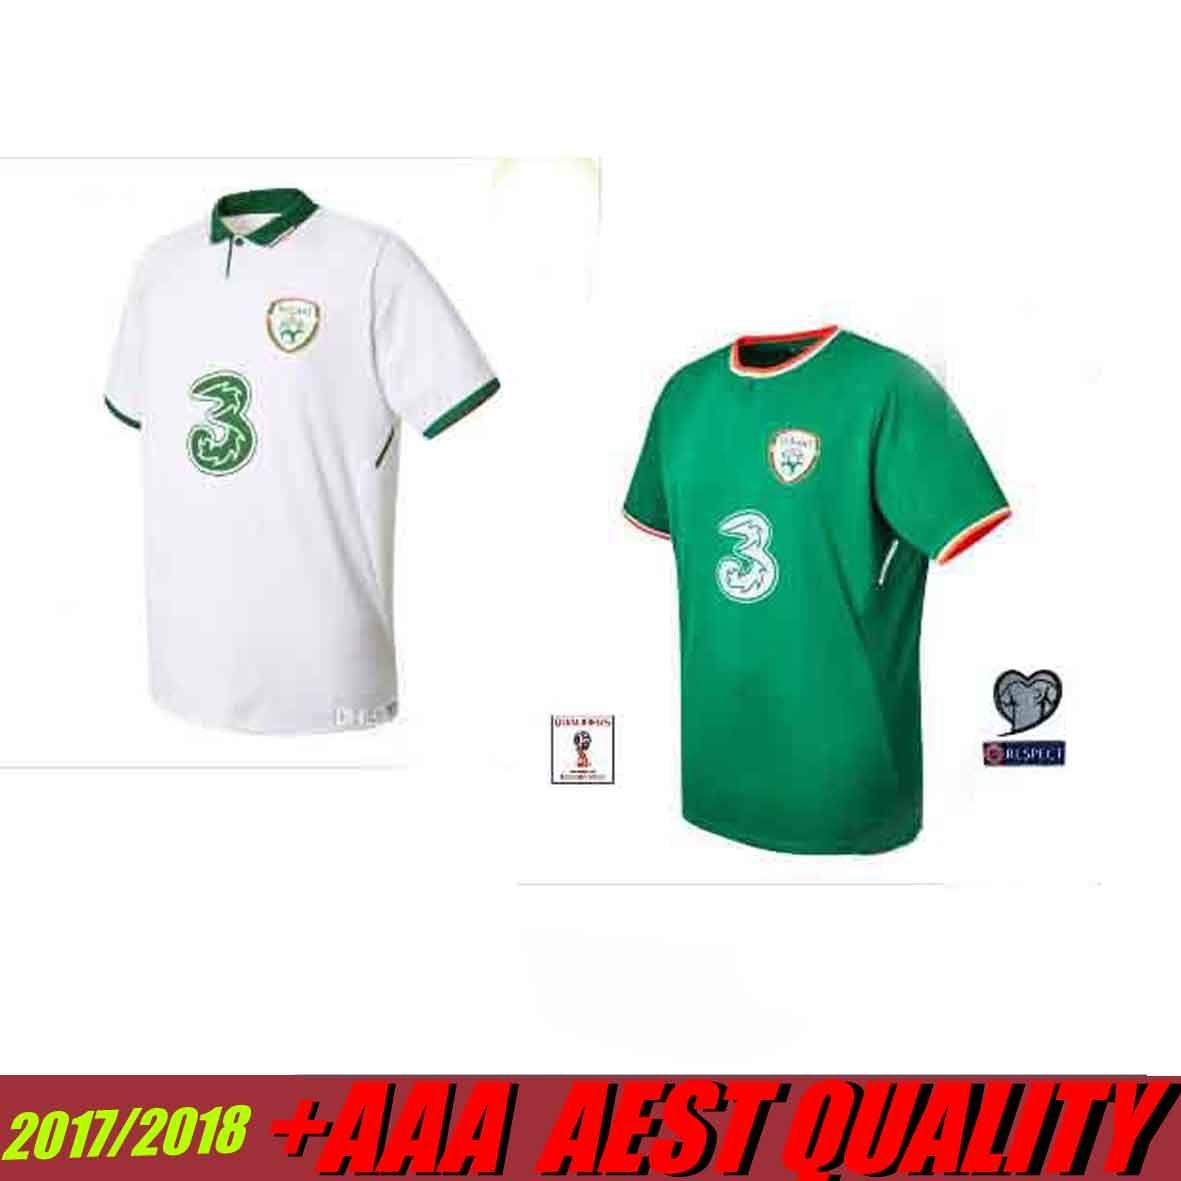 acheter benwon 16 17 irlande football maillot irlande loin chemise